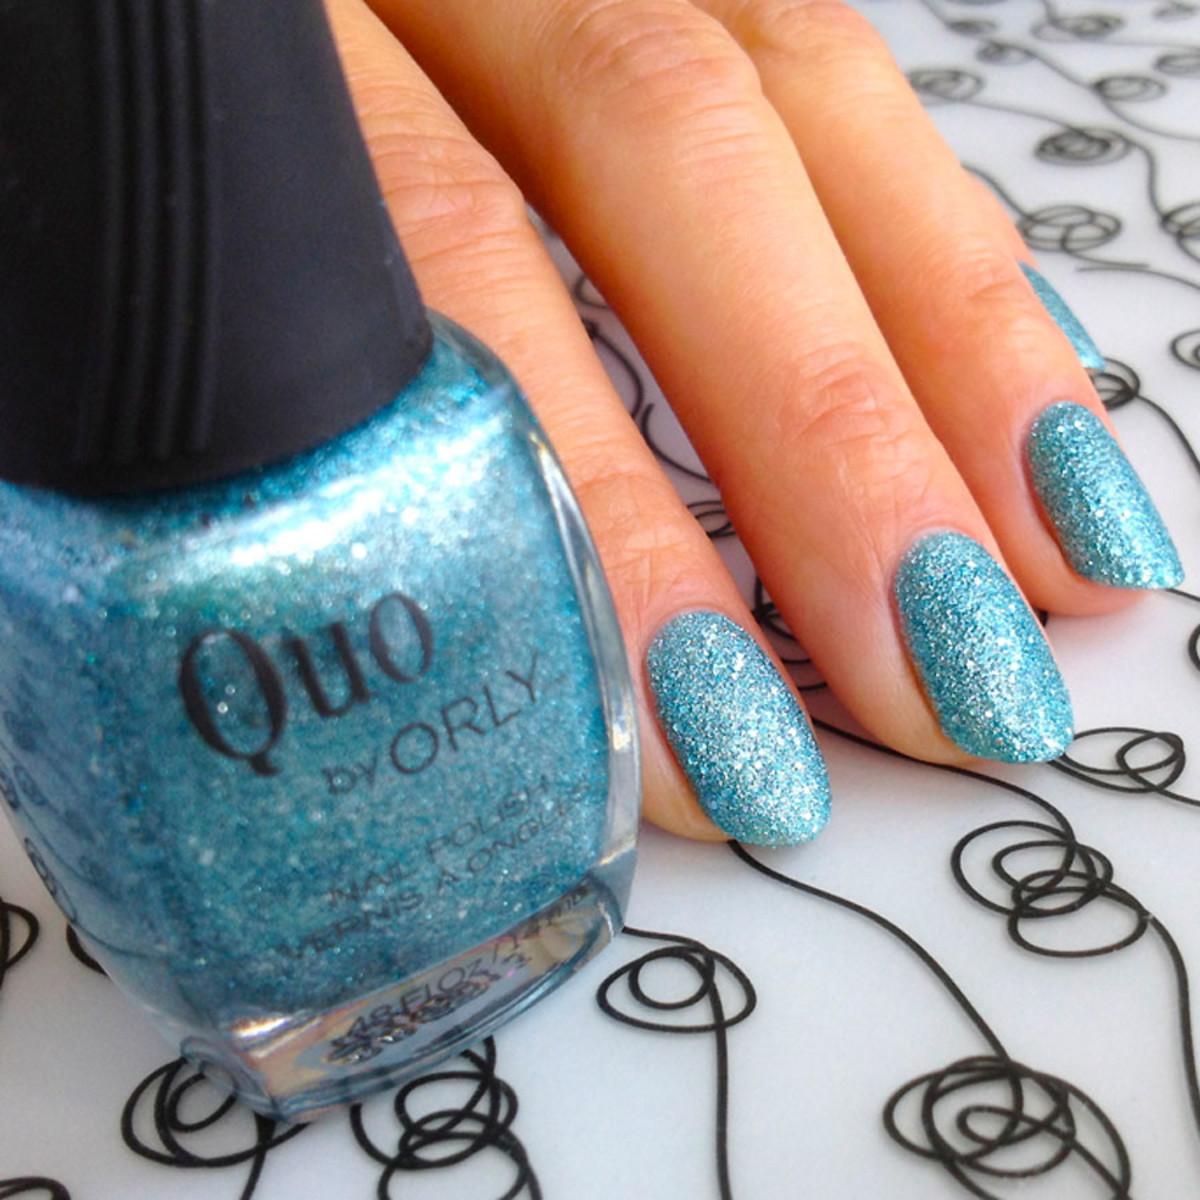 Quo by Orly Mega Aqua